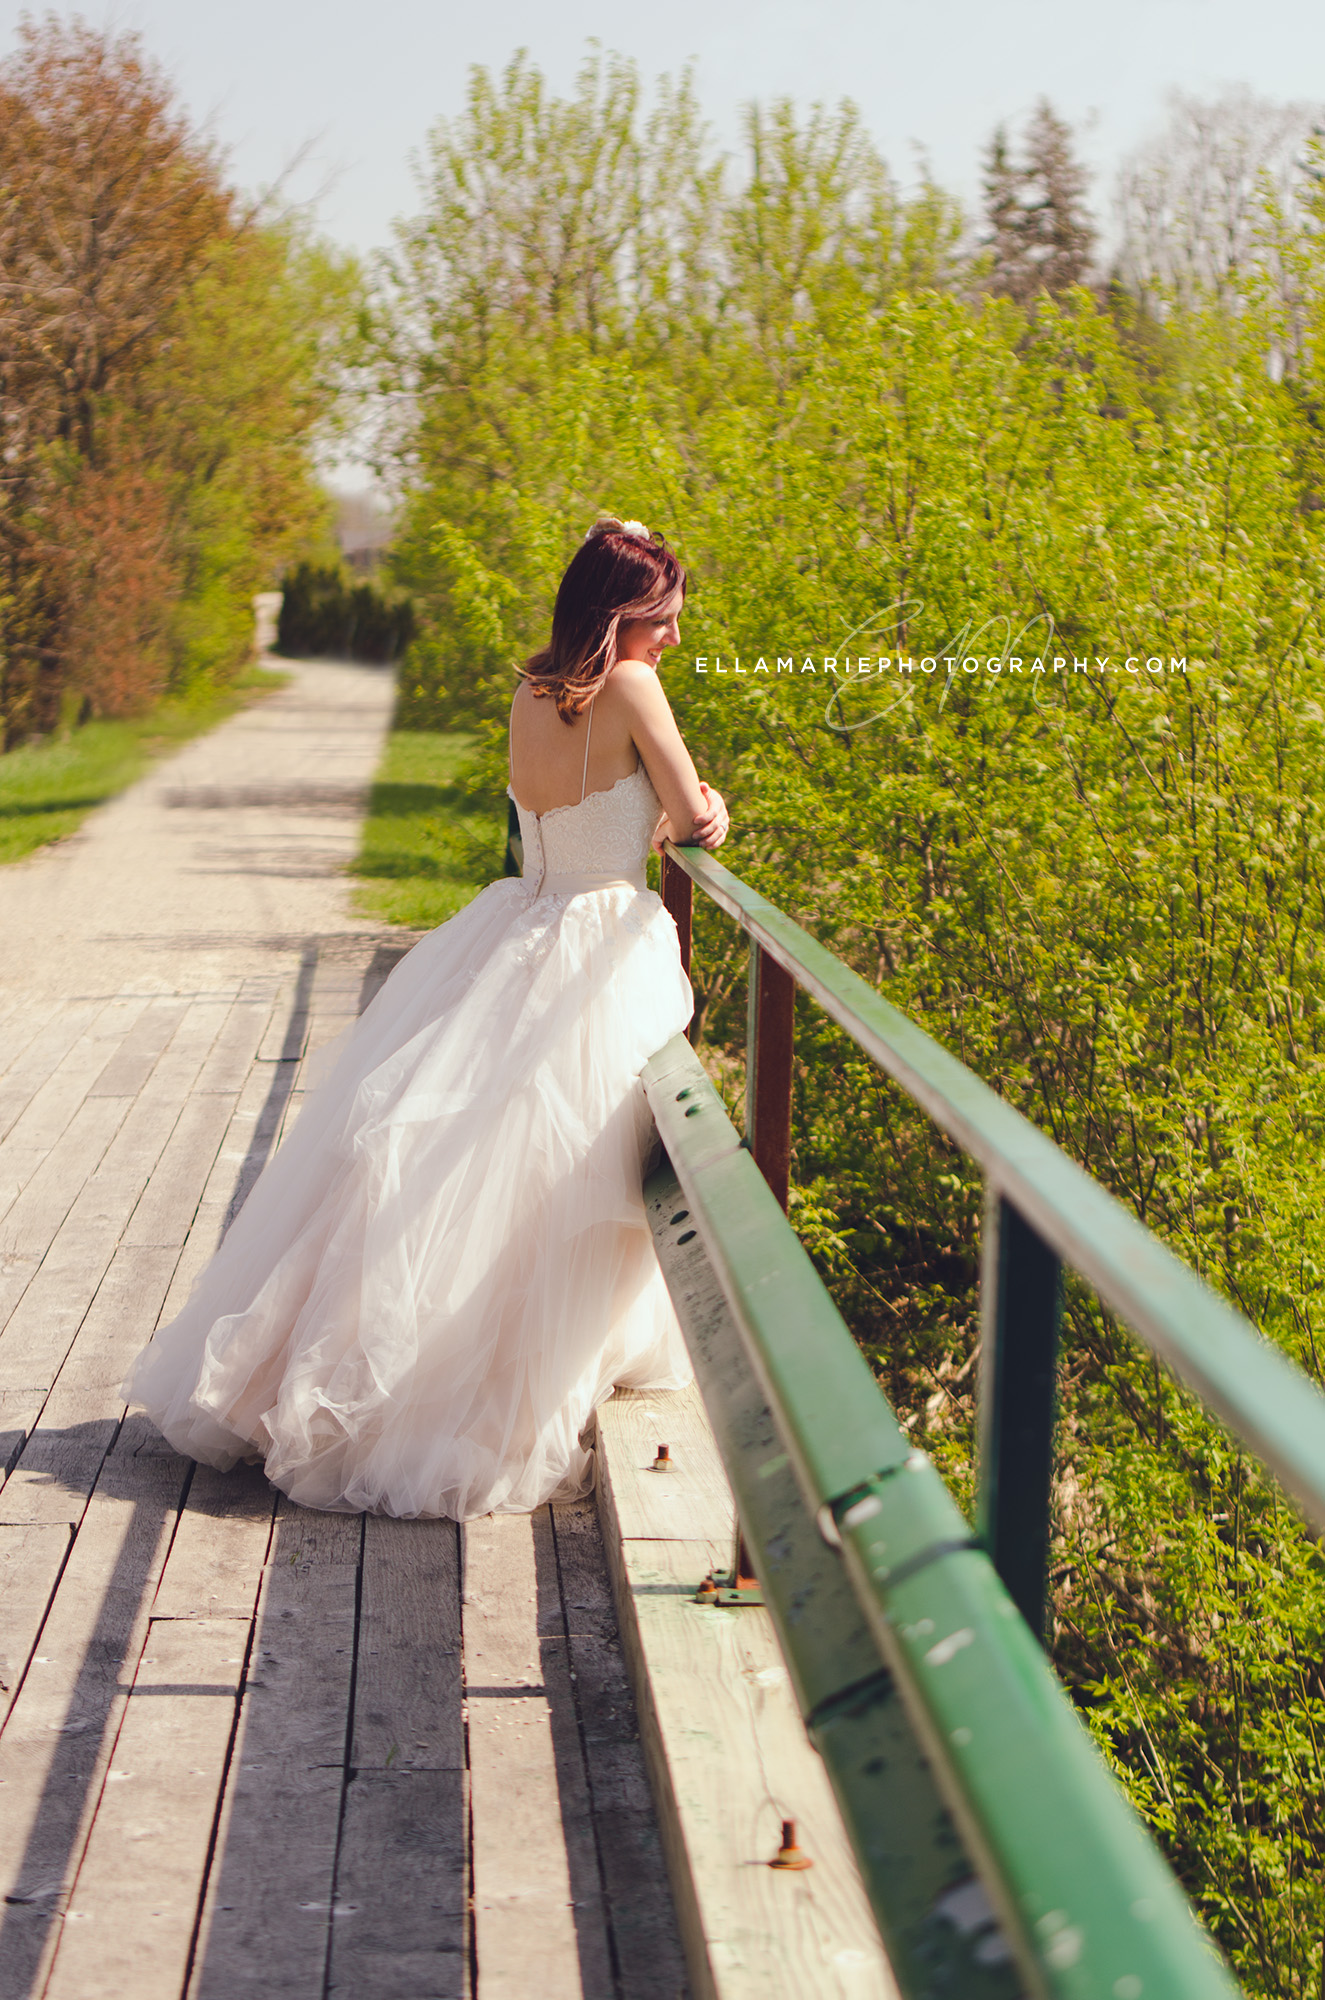 EllaMariePhotography_wedding_Baden_ON_New_Hamburg_Stratford_Waterloo_Kitchener_Guelph_Cambridge_Listowel_photographer_photography_05.jpg